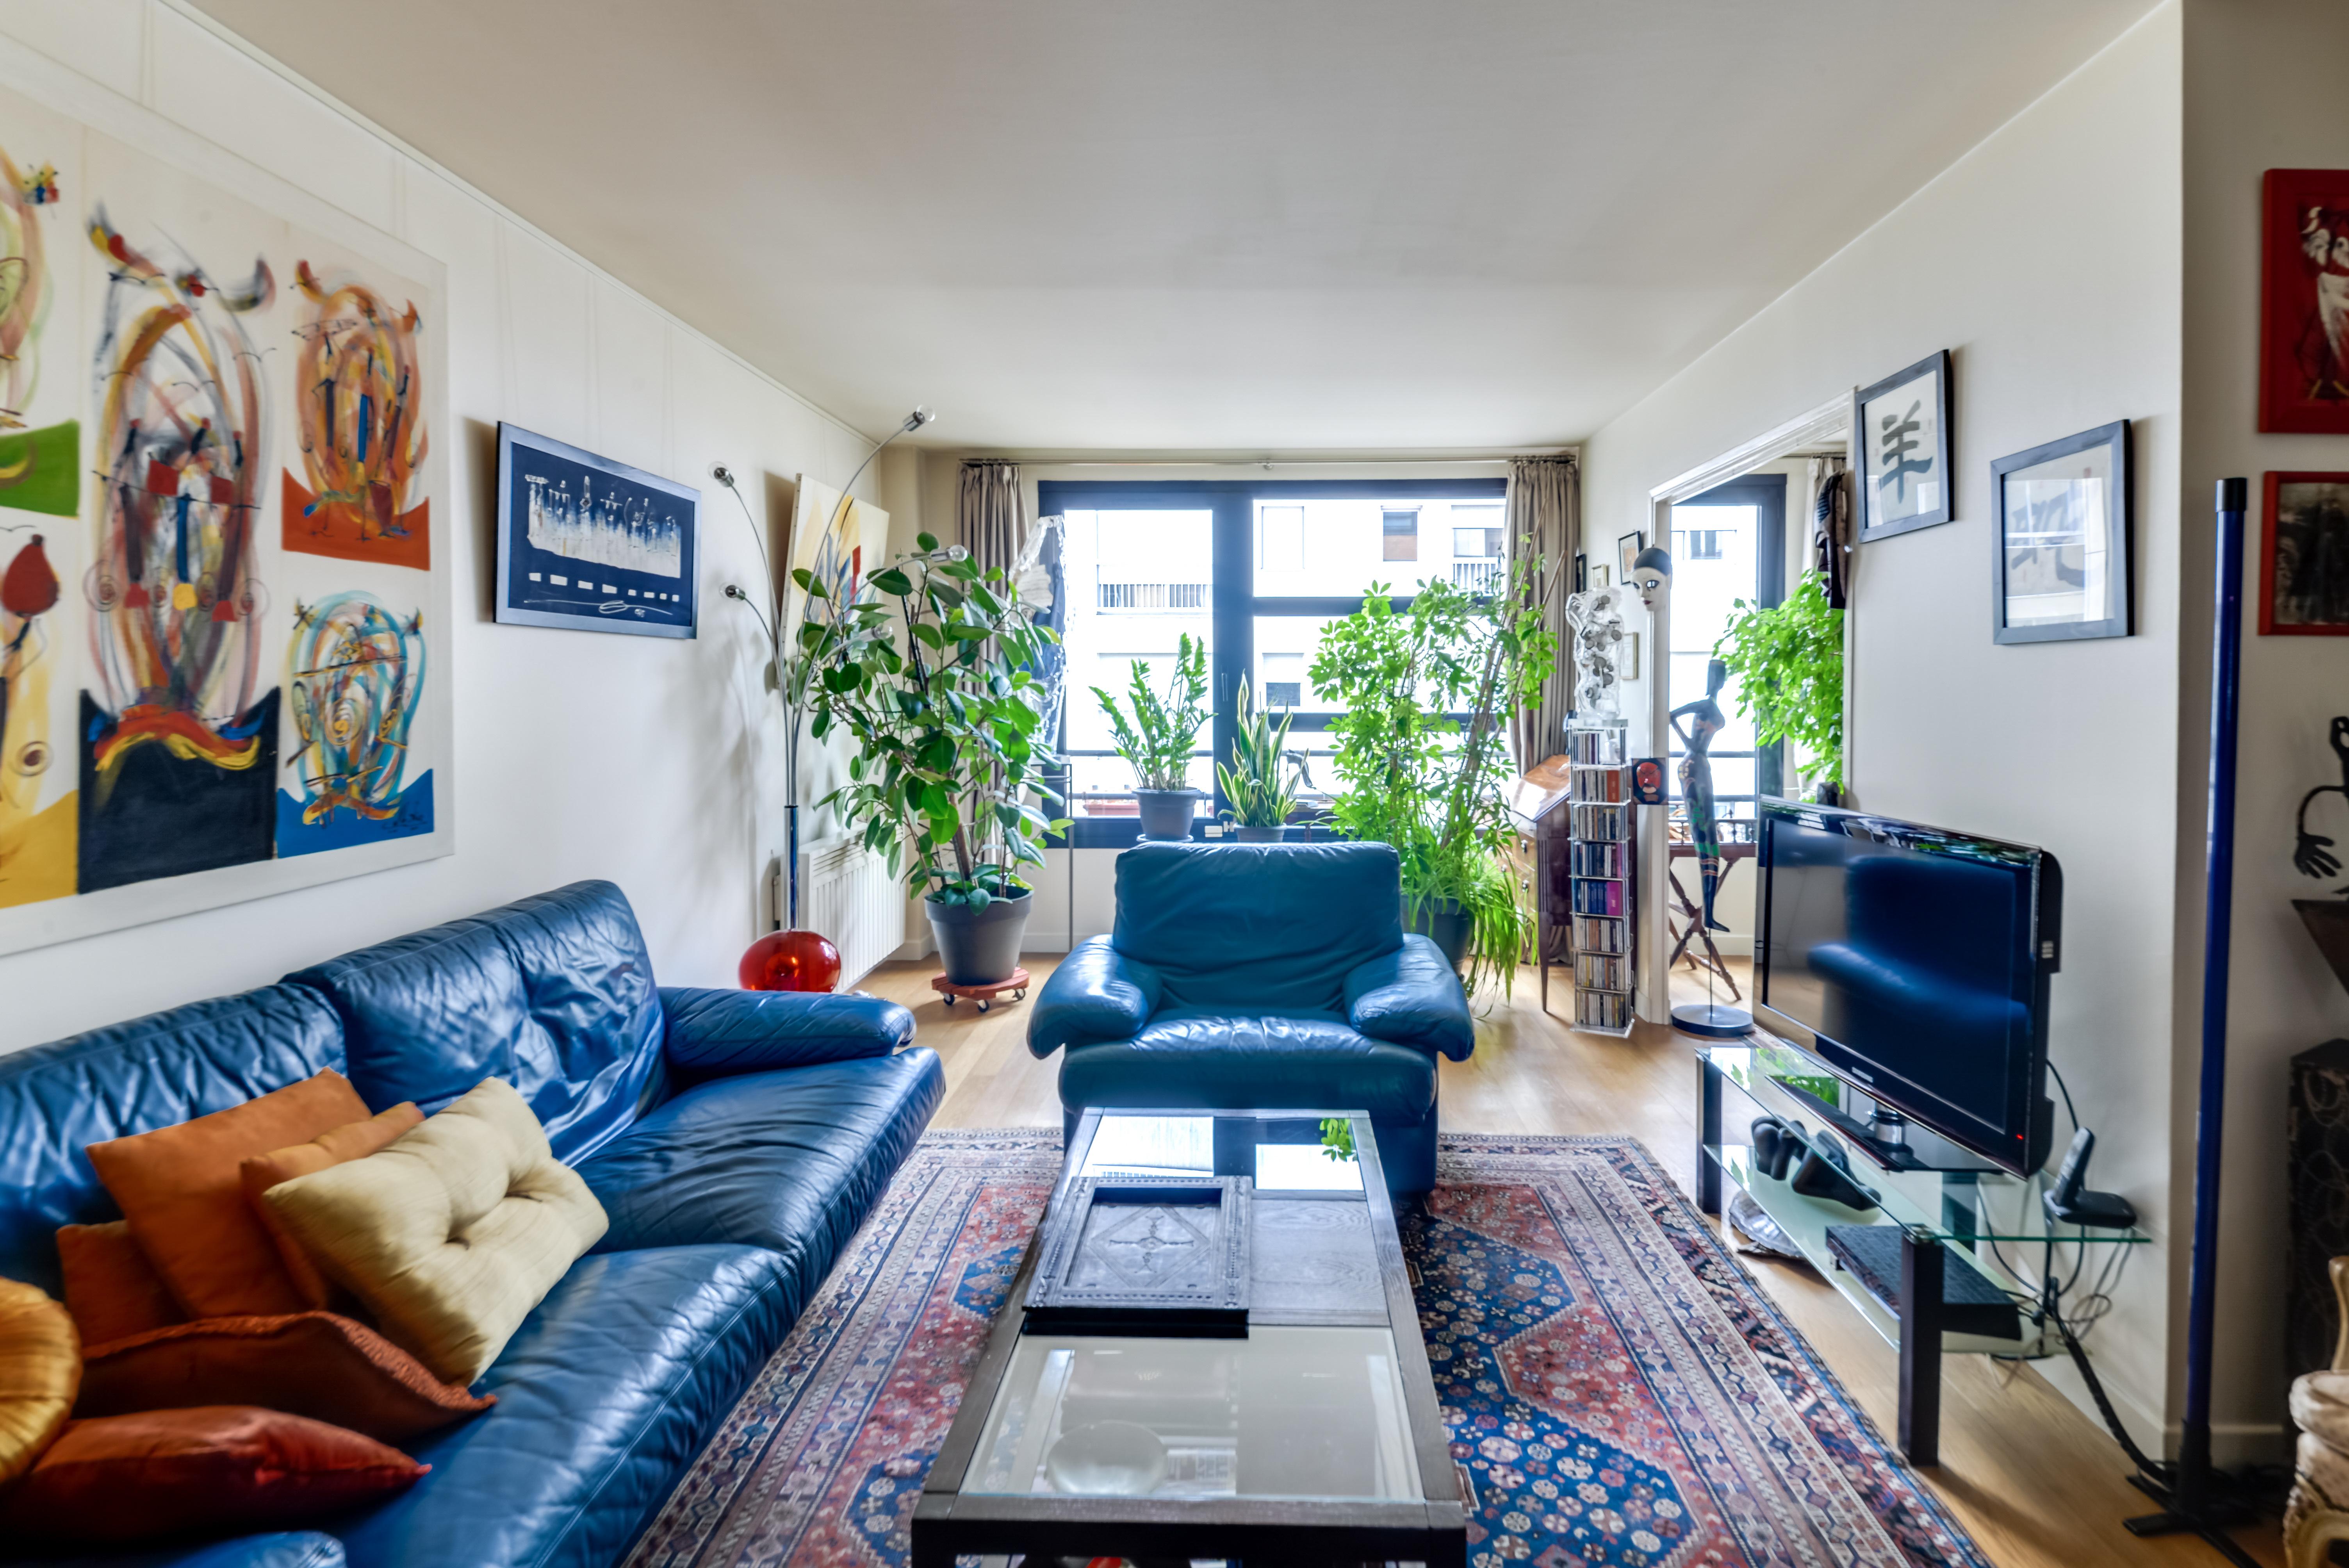 meero photographe immobilier-3.jpg